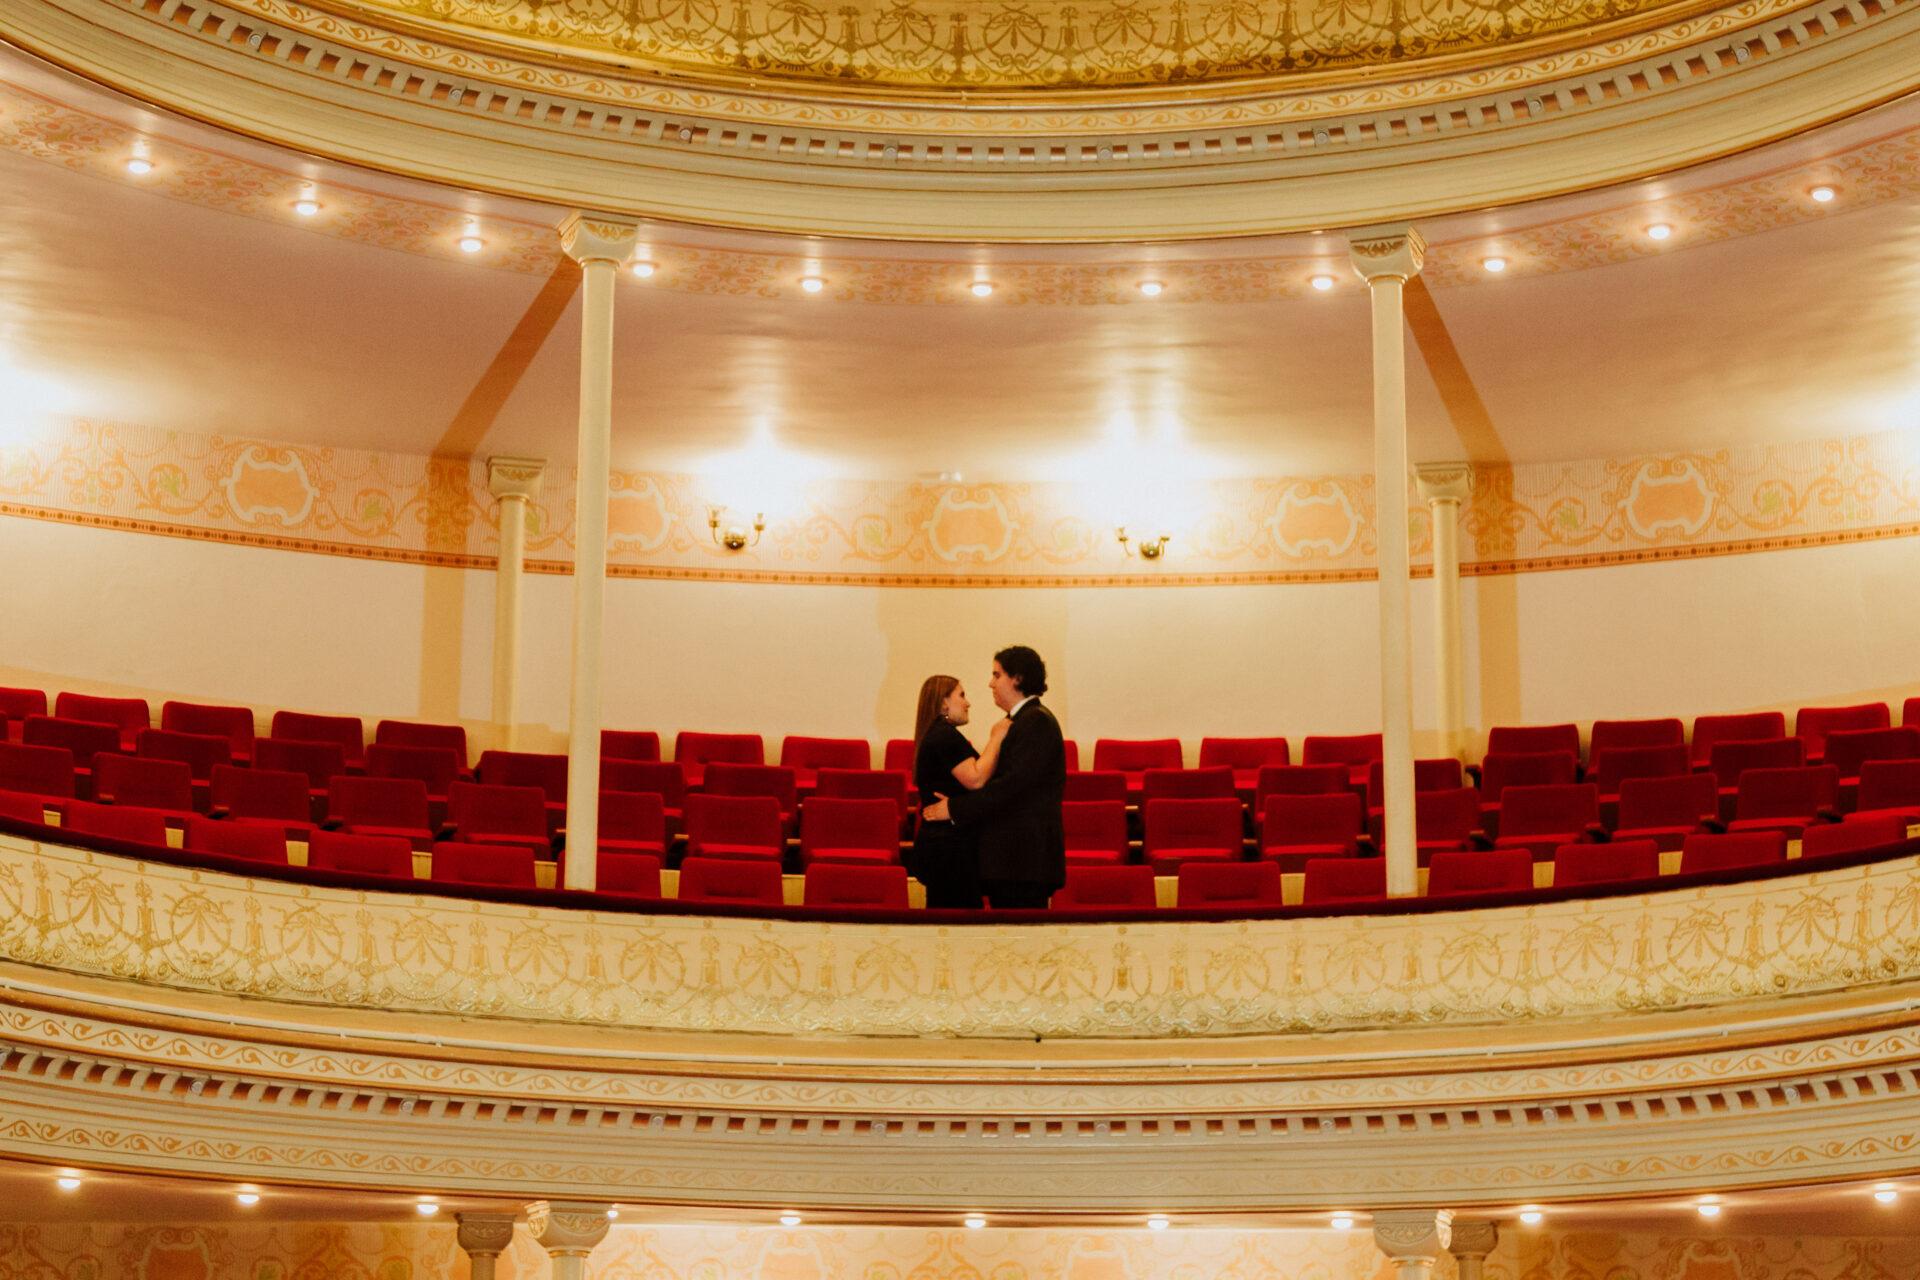 javier_noriega_fotografo_save_the_date_zacatecas_wedding_photographer8